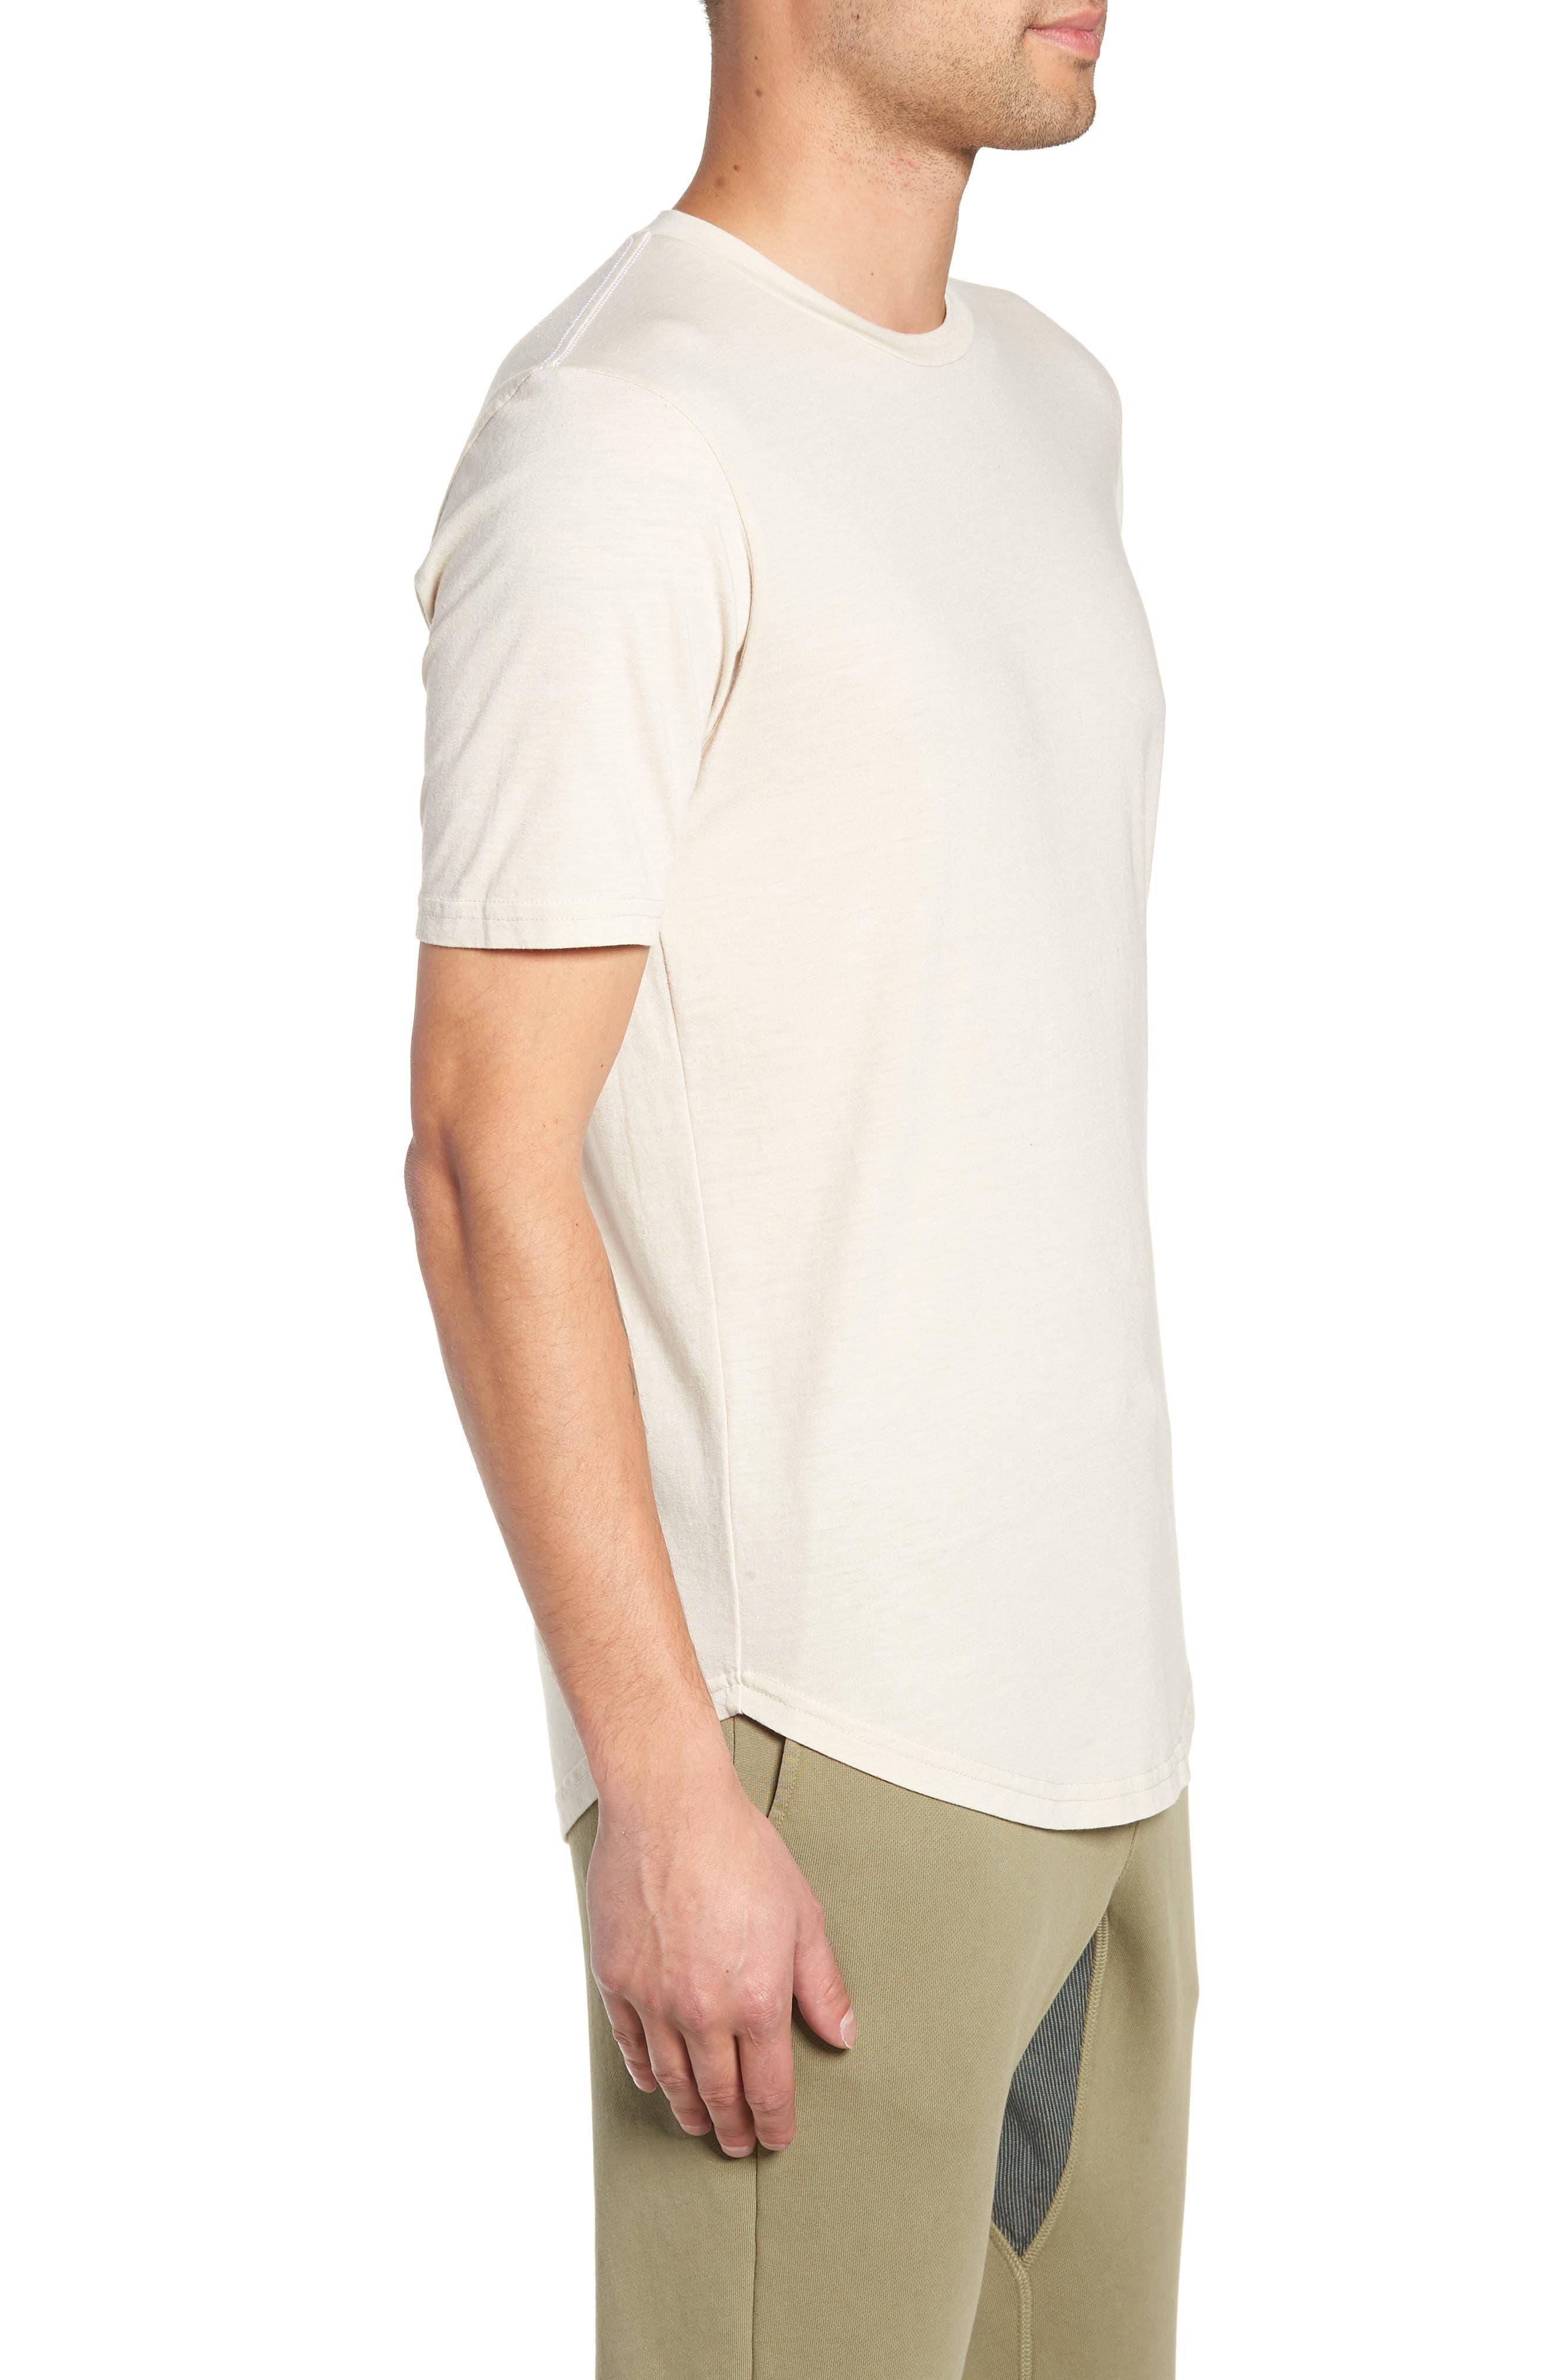 GOODLIFE, Scallop Triblend Crewneck T-Shirt, Alternate thumbnail 3, color, OYSTER